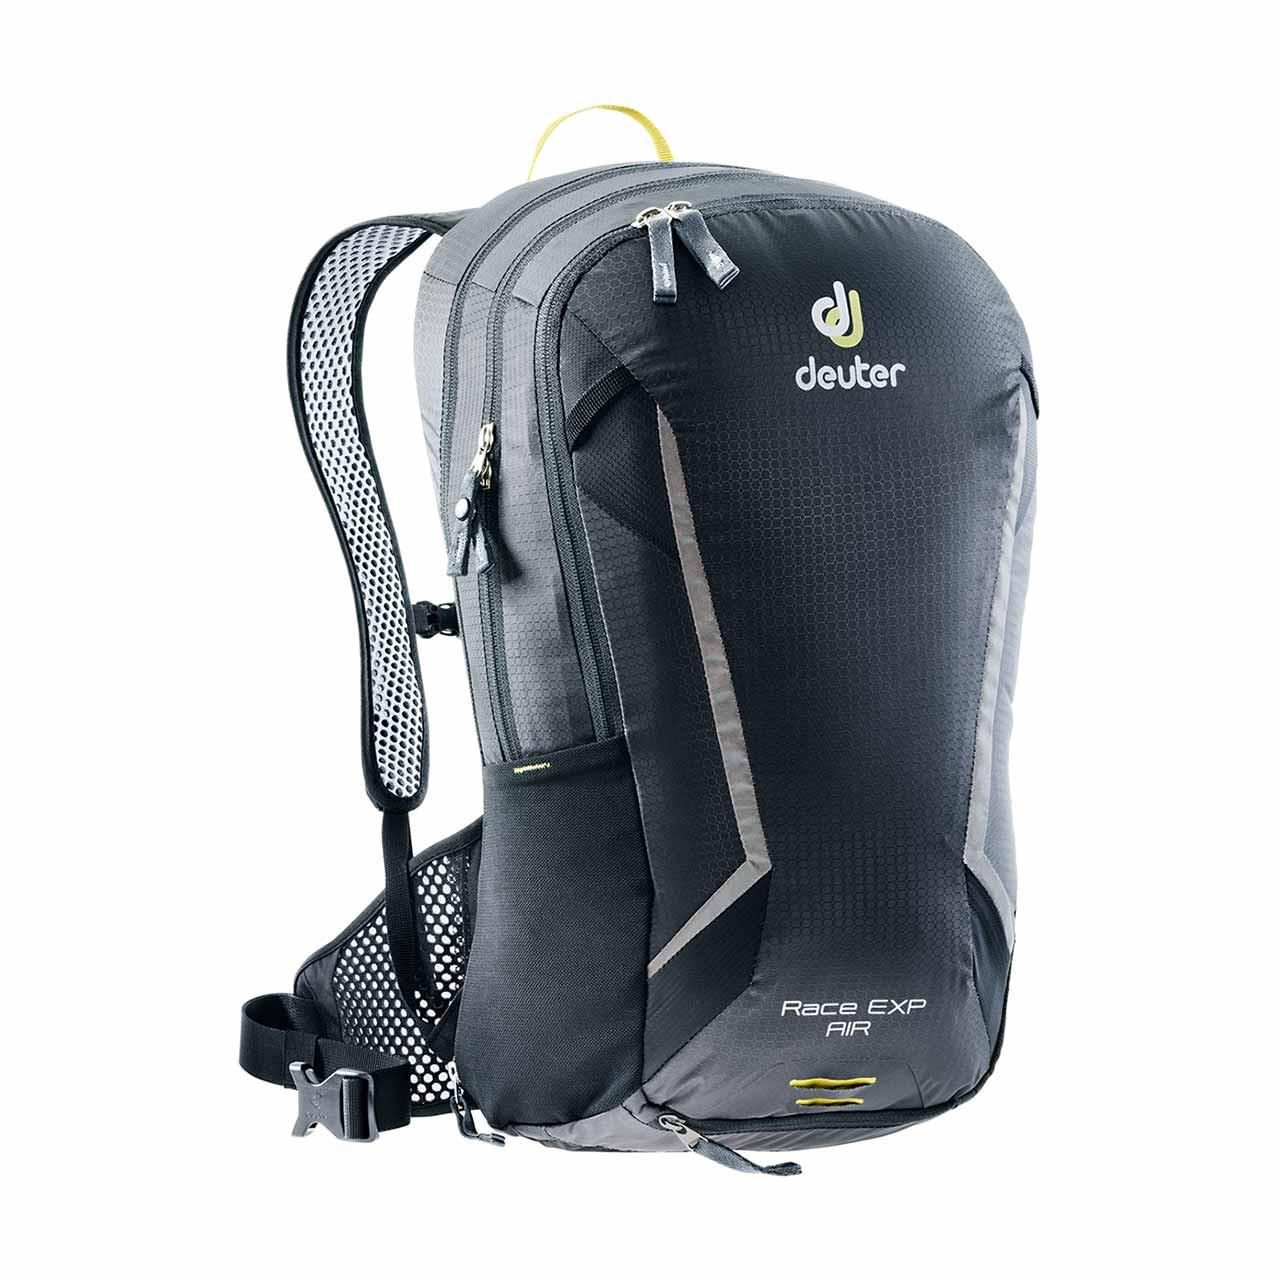 635c4bd0459 Deuter Race EXP Air Backpack | Campman